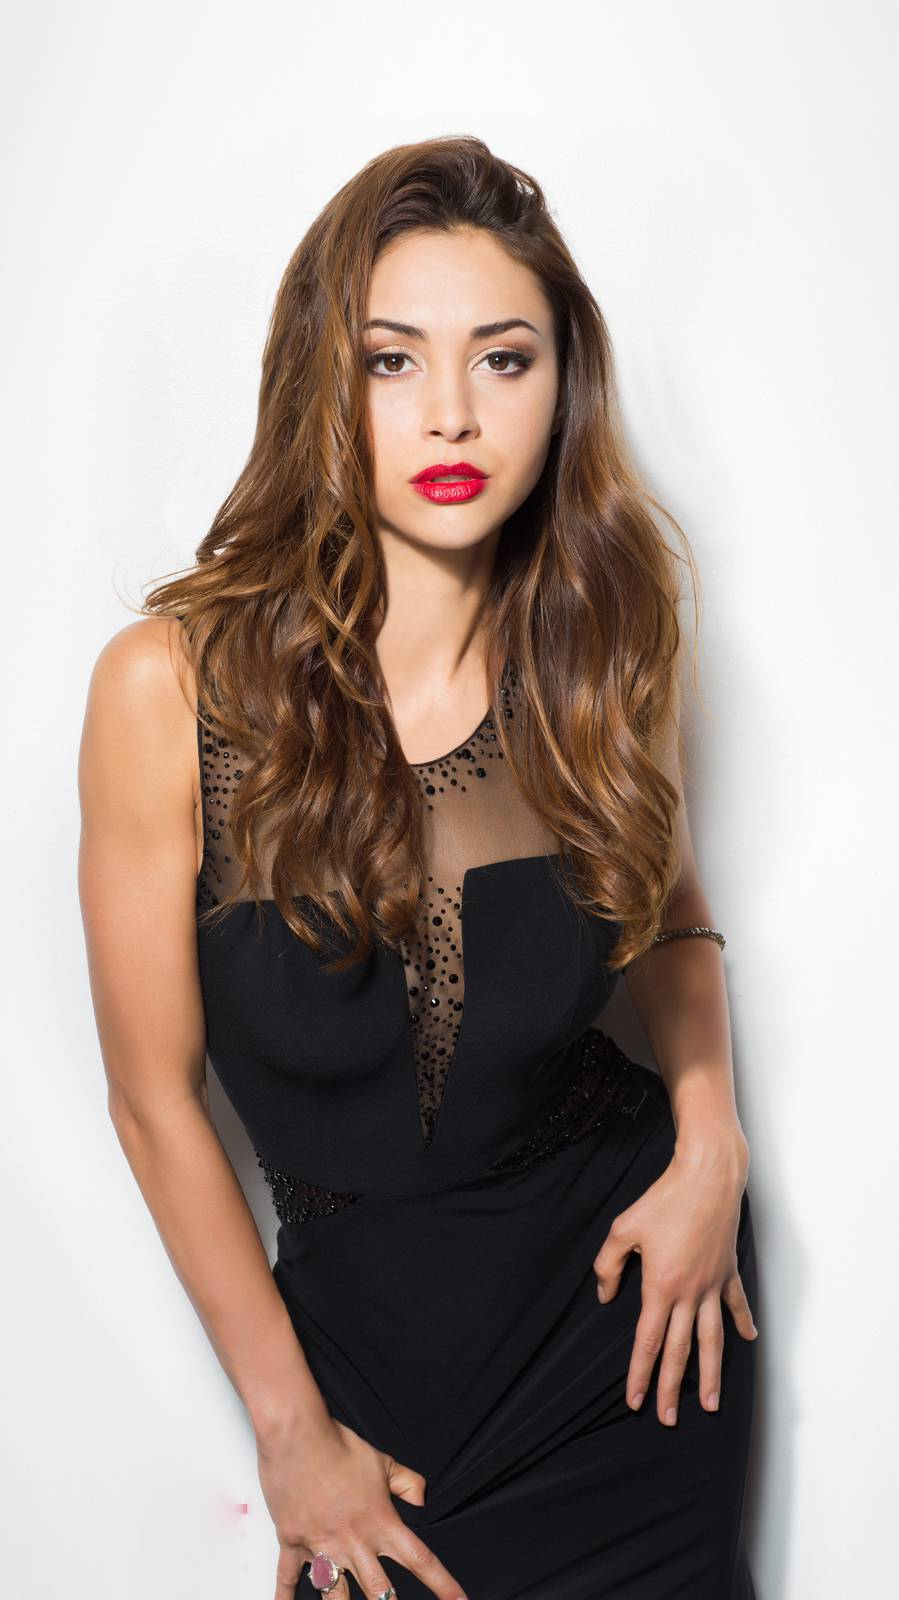 Lindsey Morgan Red Lips Brunette iPhone Wallpaper